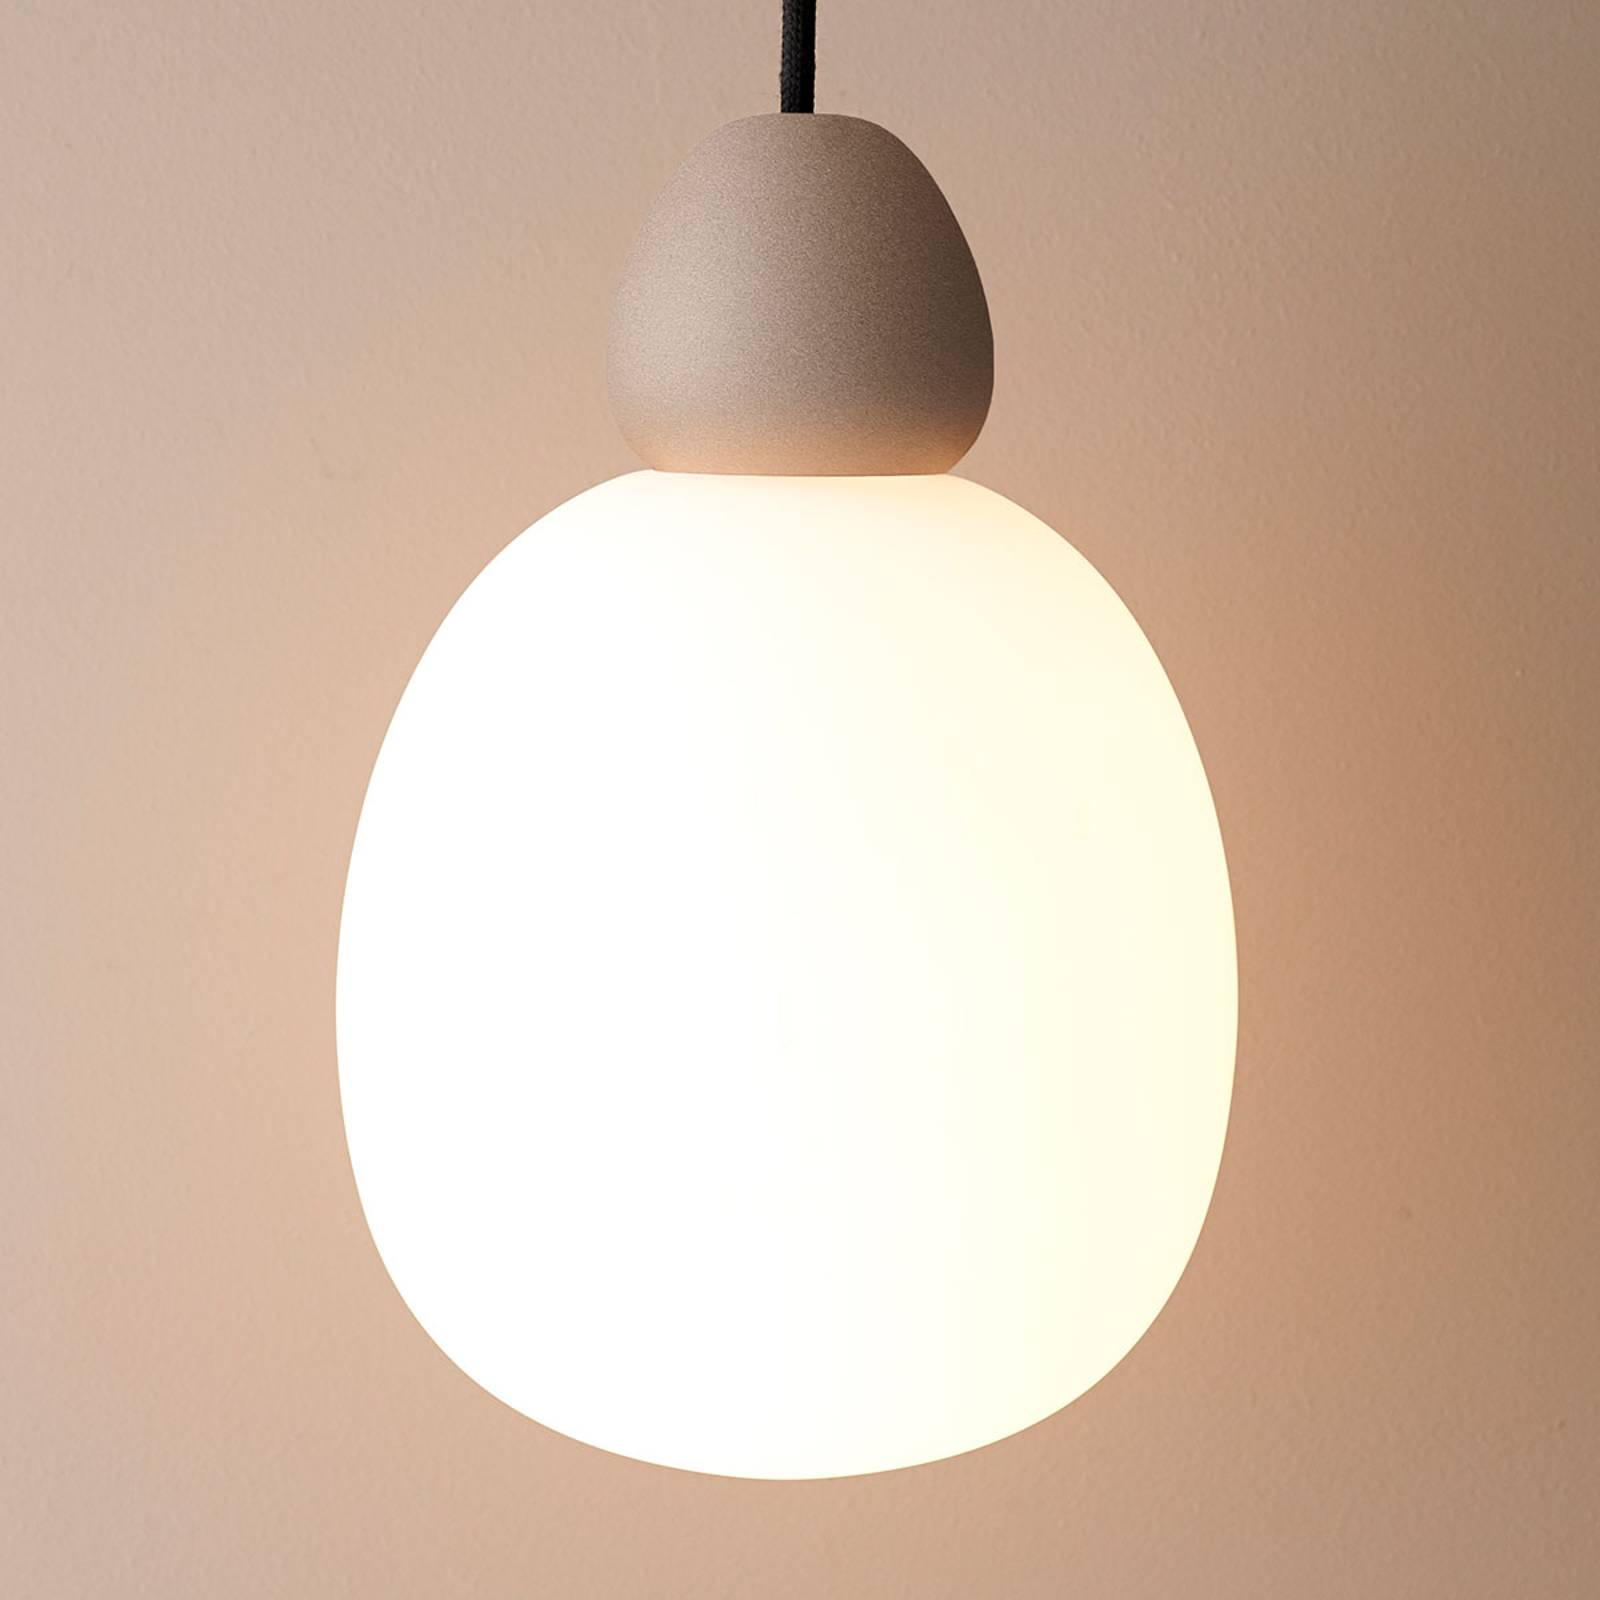 Glazen hanglamp Buddy ophanging zand